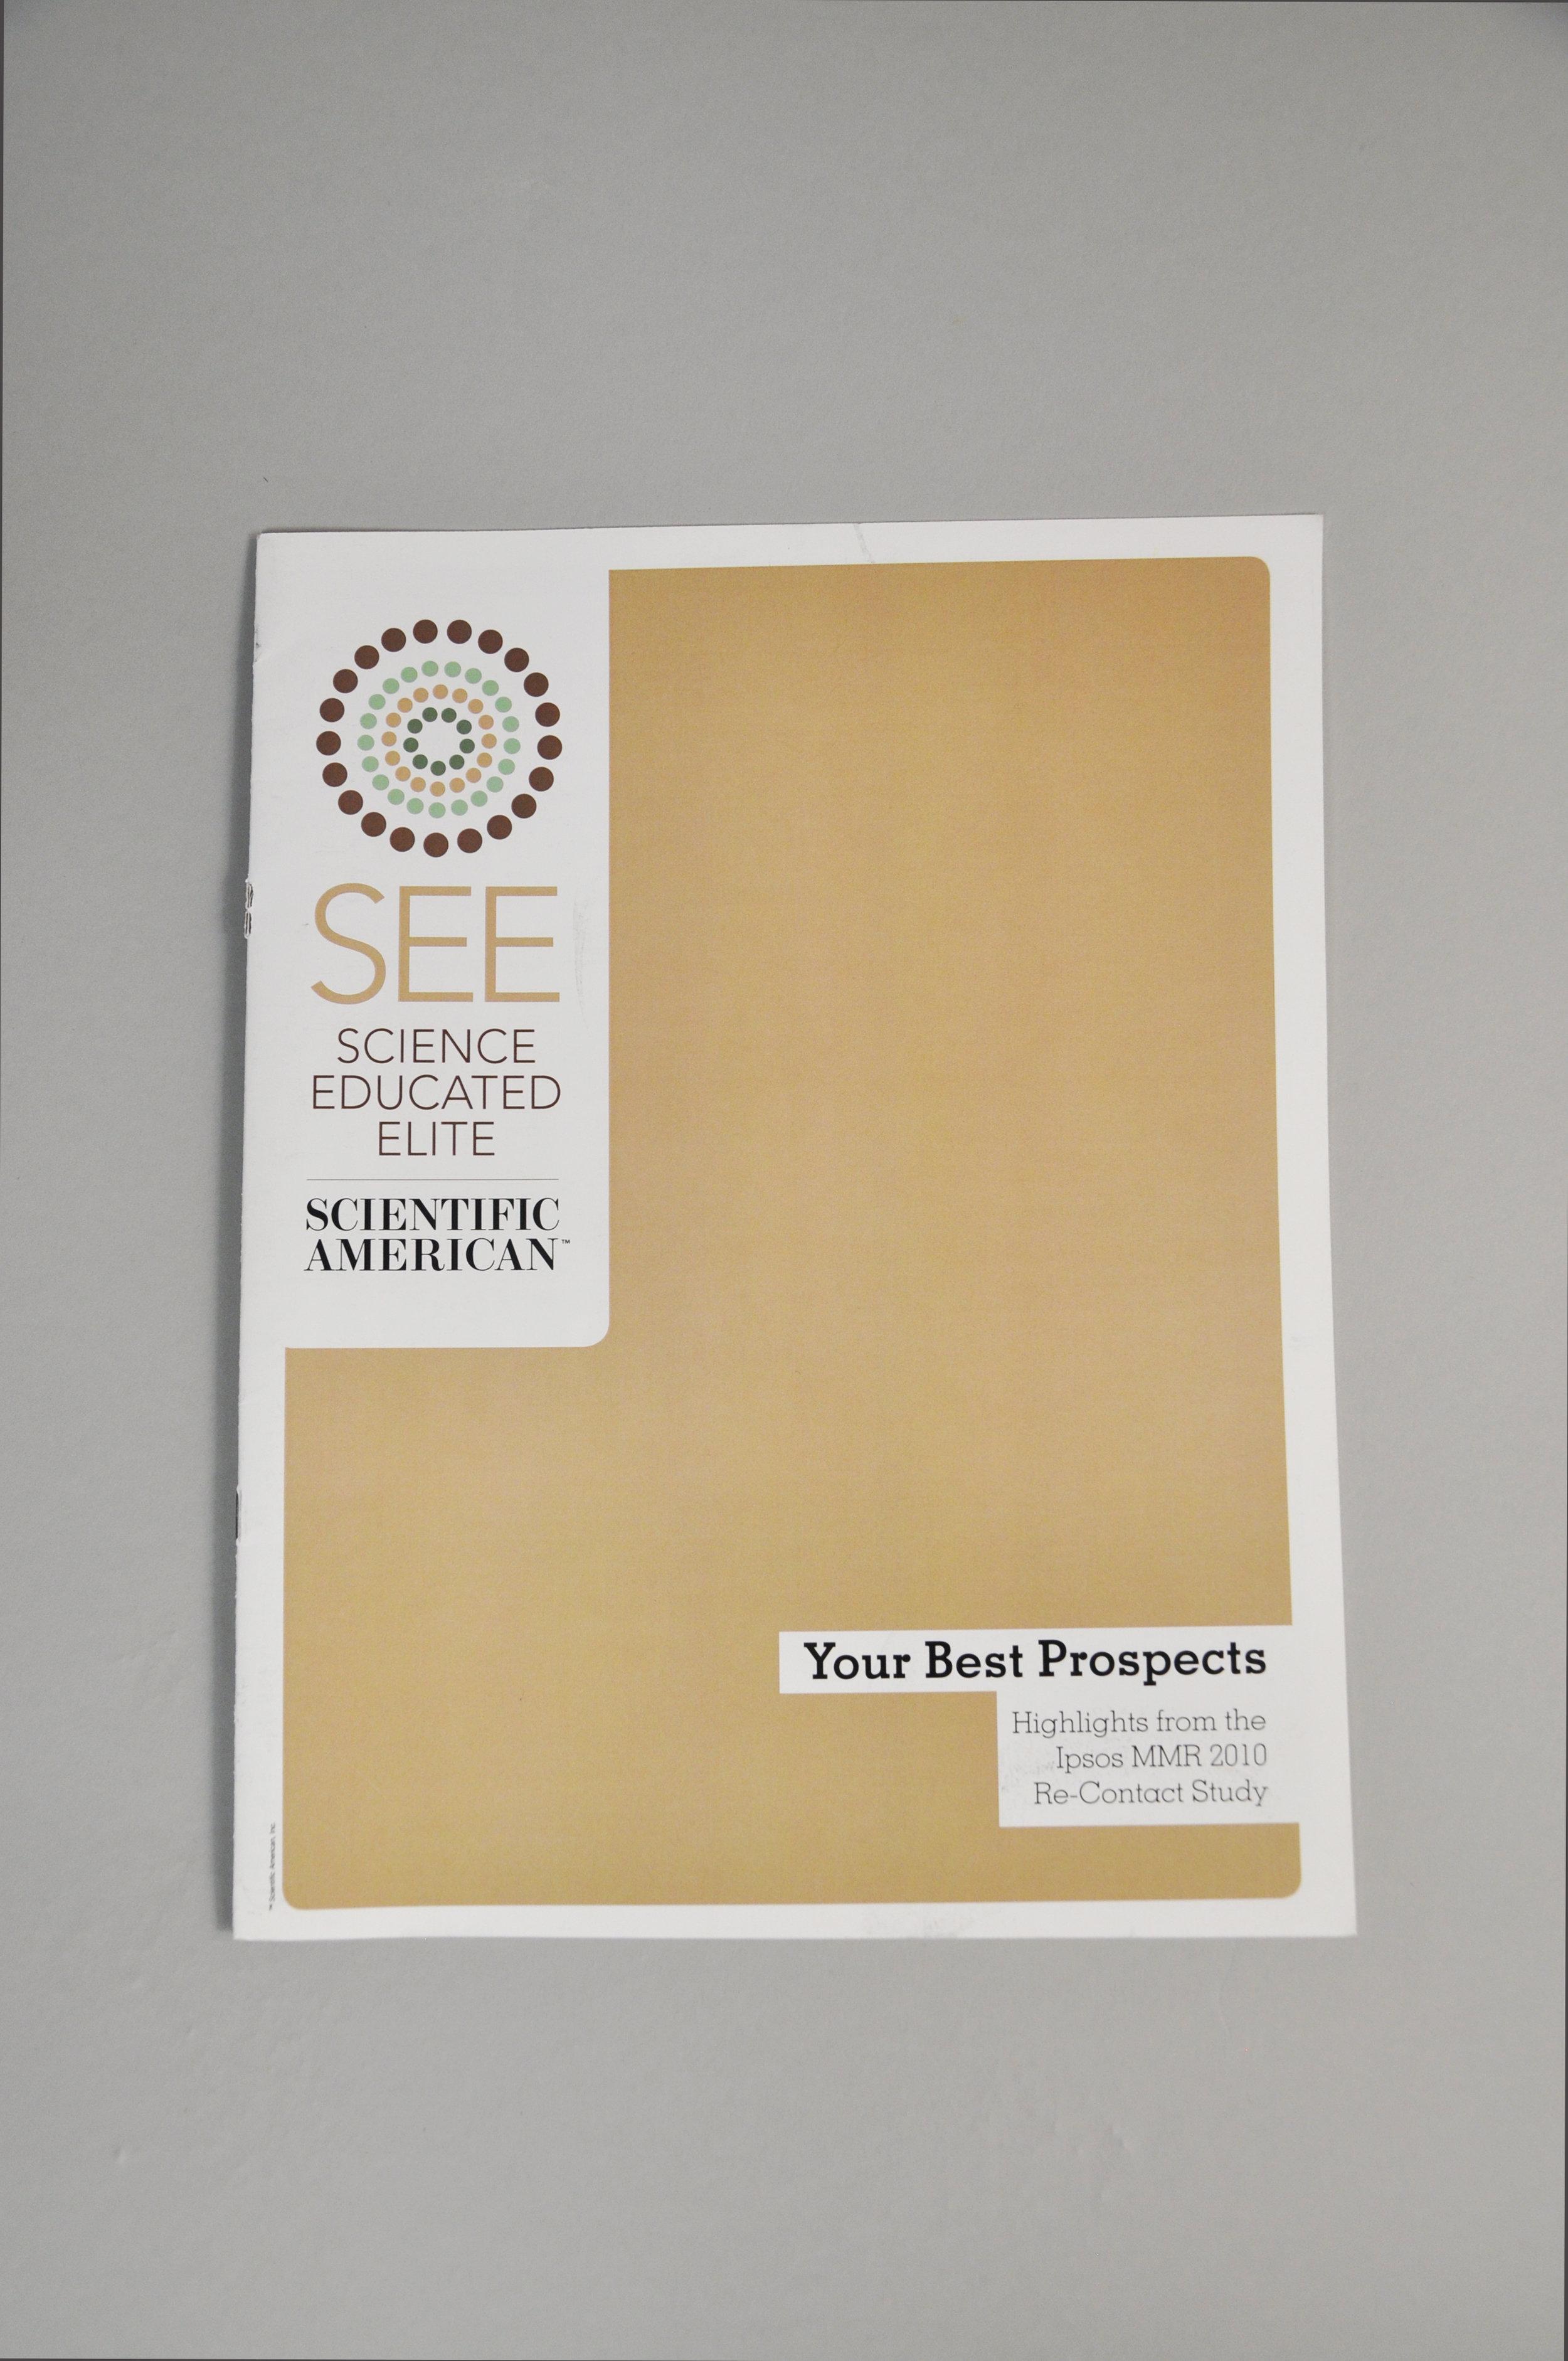 Science Elite Brochure front cover